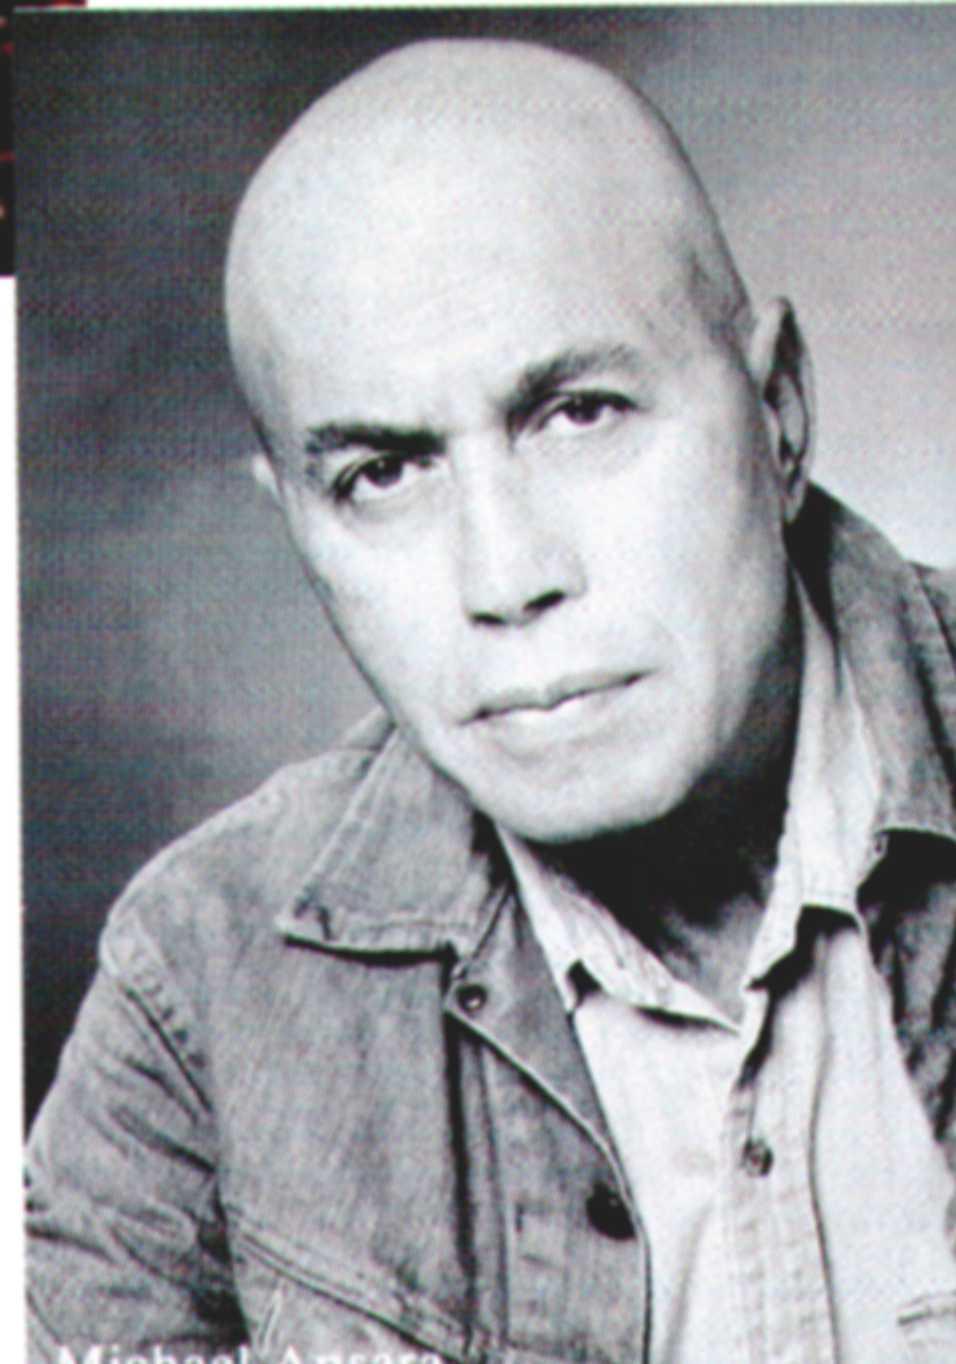 Michael Ansara Michael Ansara